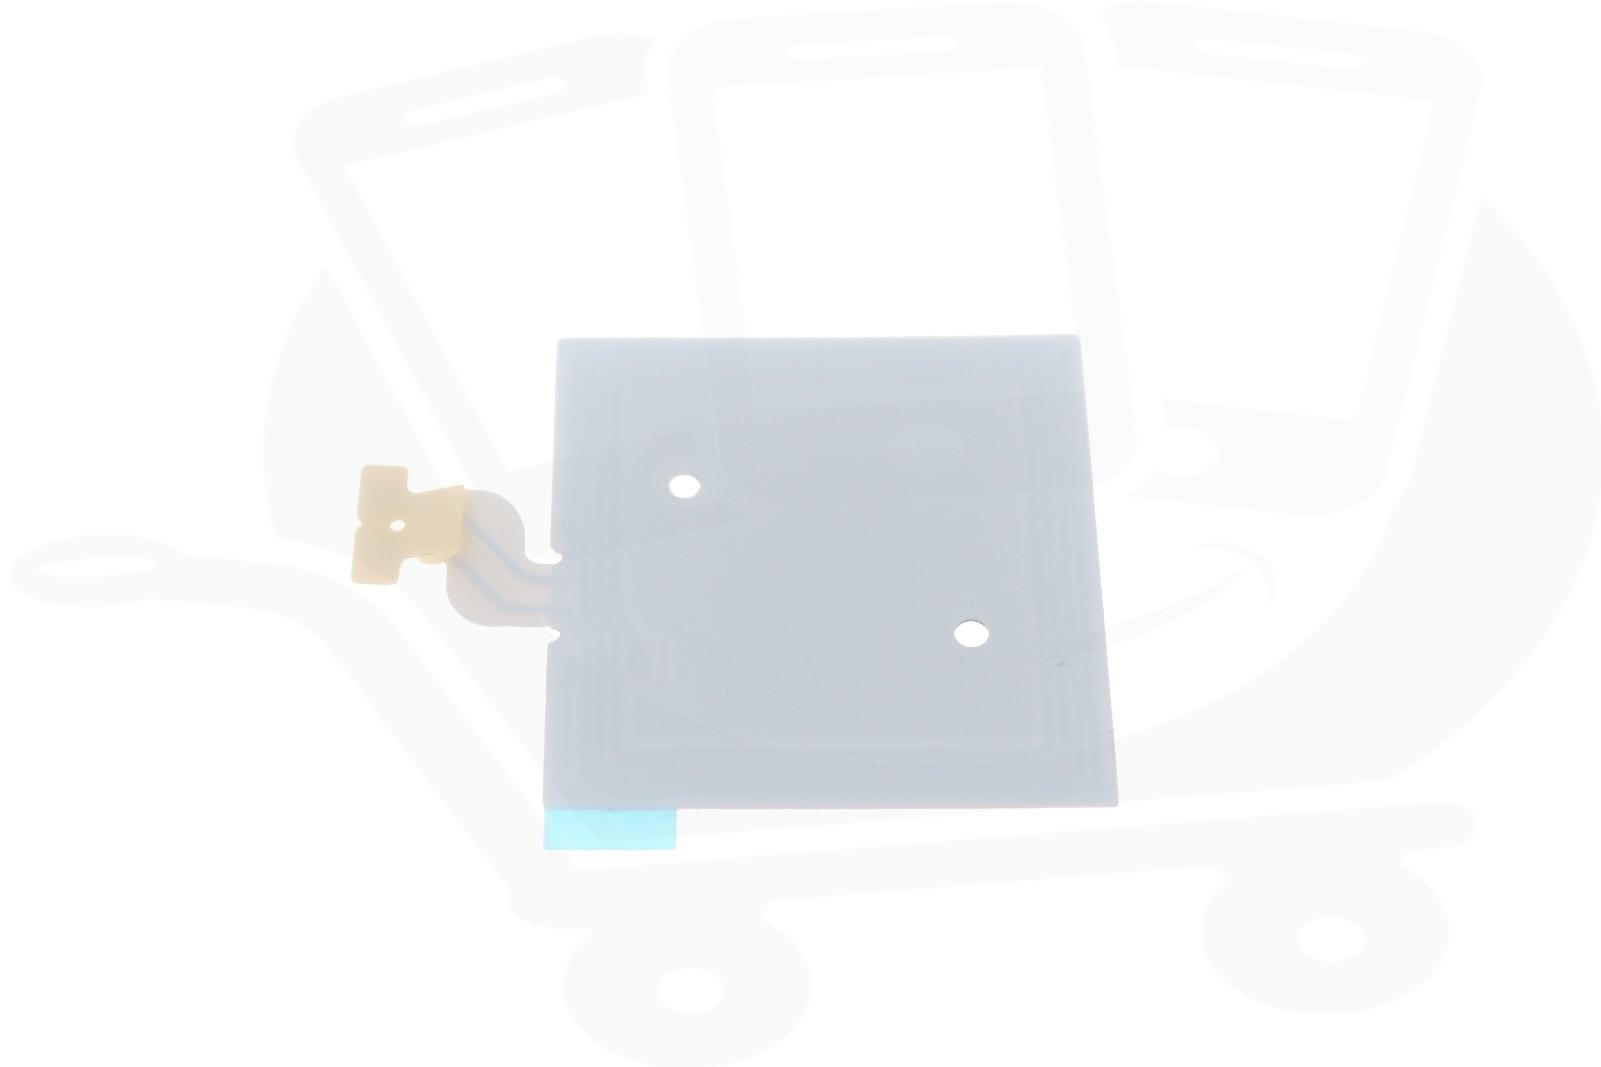 Genuine Huawei P9 Lite (VNS-L21) NFC Antenna - 27162461